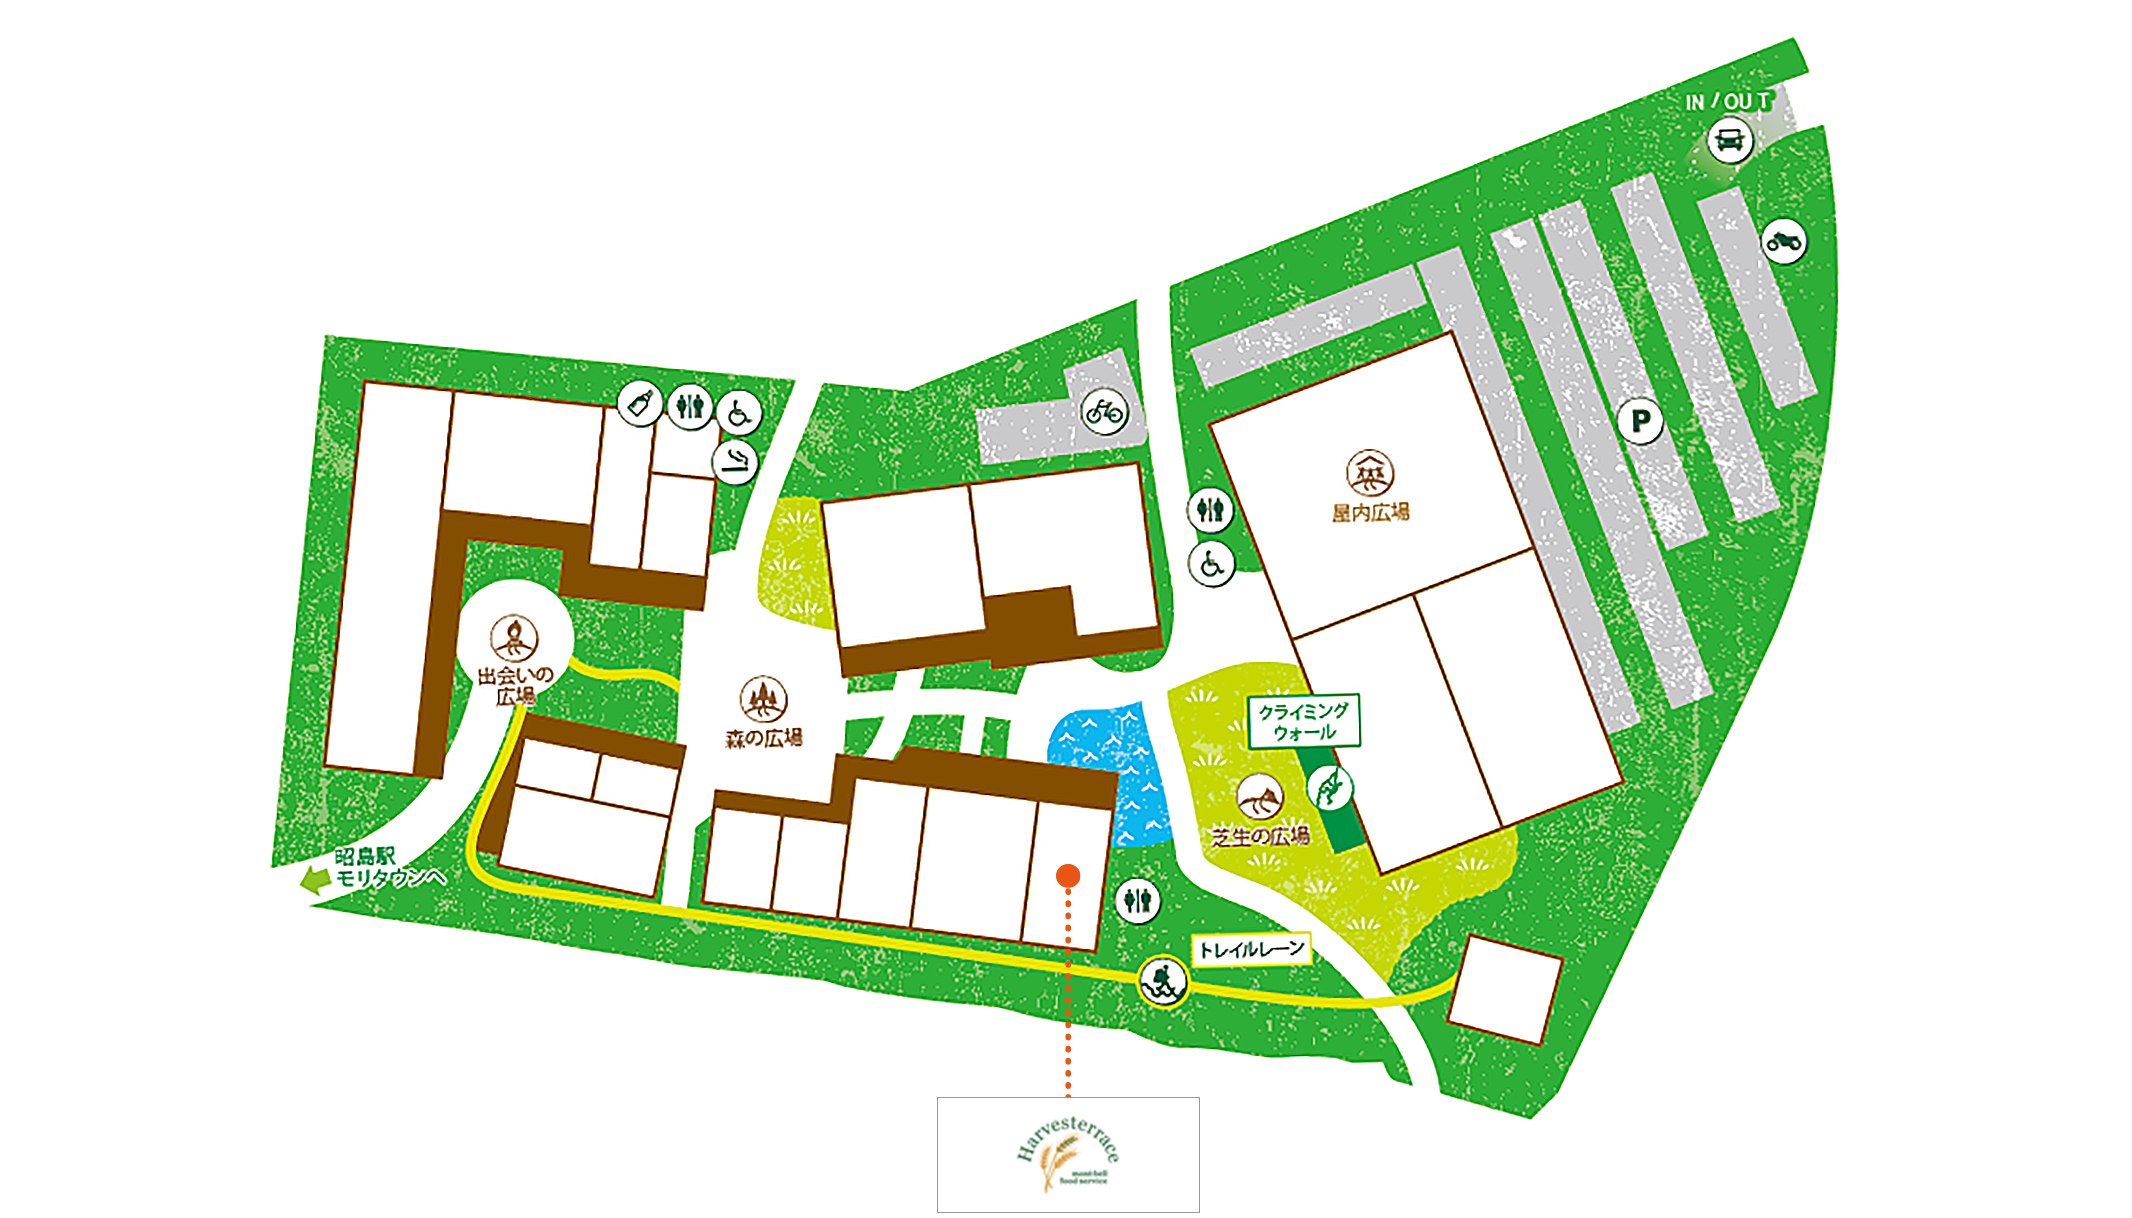 Harvesterrace 昭島アウトドアヴィレッジ店map